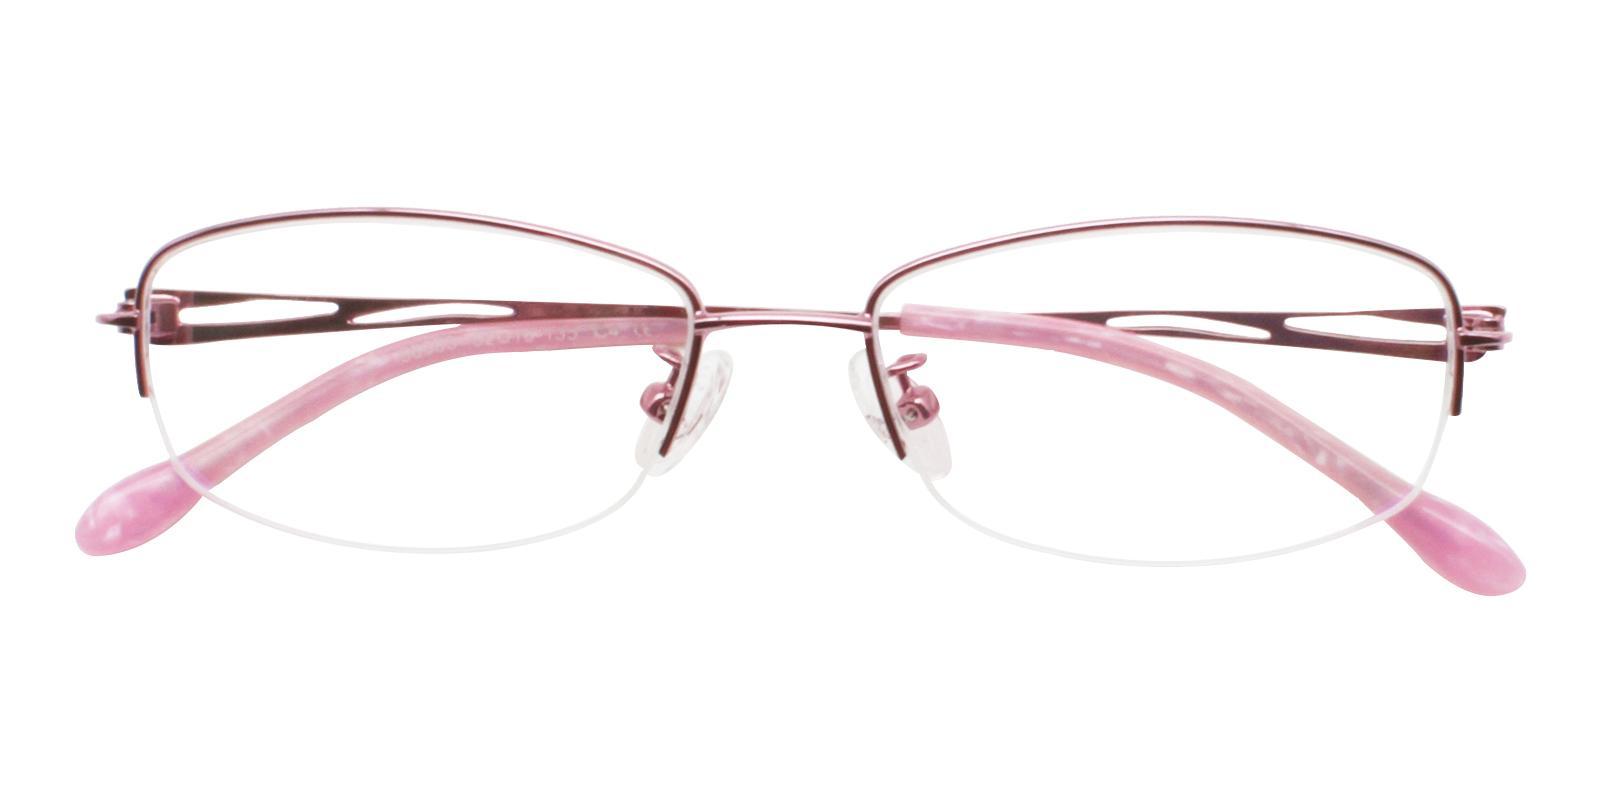 Elizabeth Pink Metal Eyeglasses , NosePads Frames from ABBE Glasses